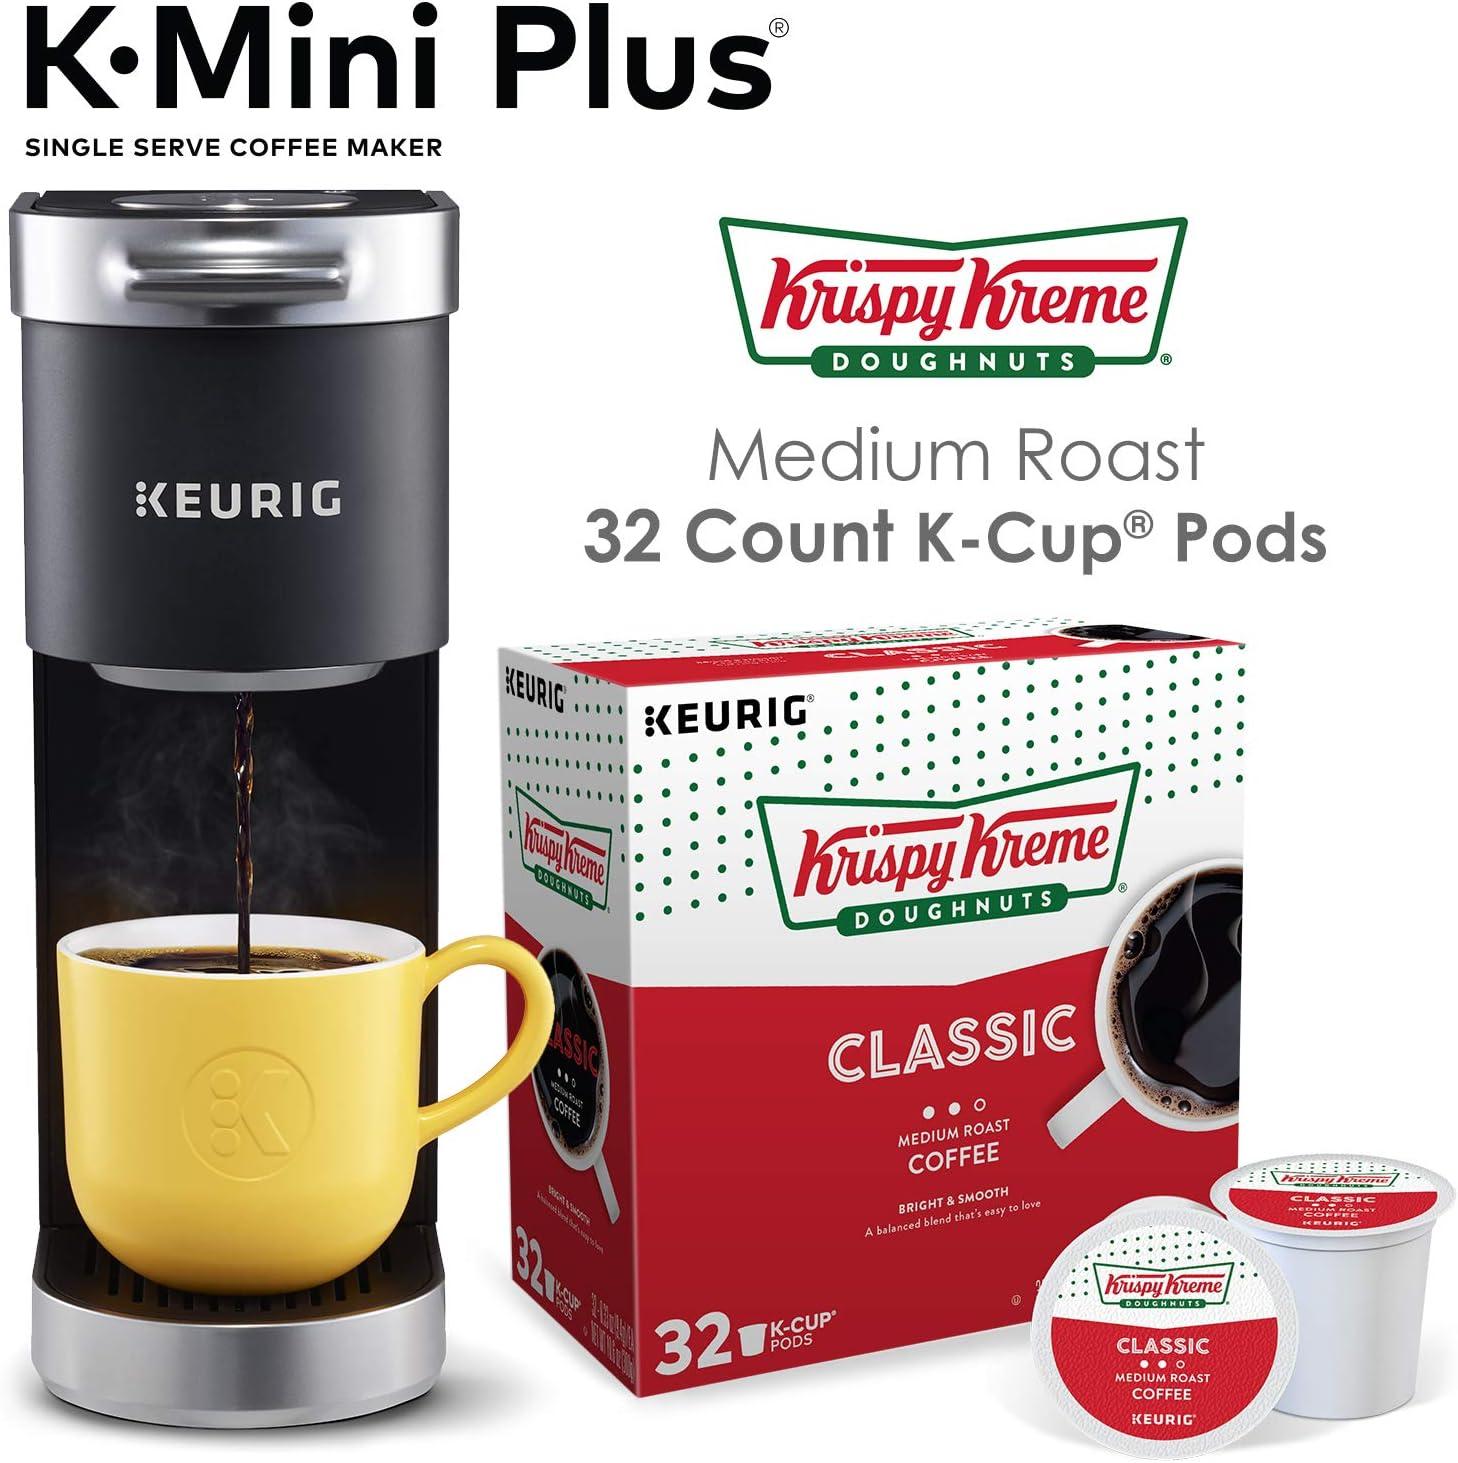 Keurig K-Mini Plus Single Serve Coffee Maker with Krispy Kreme Coffee Pods, 32 count